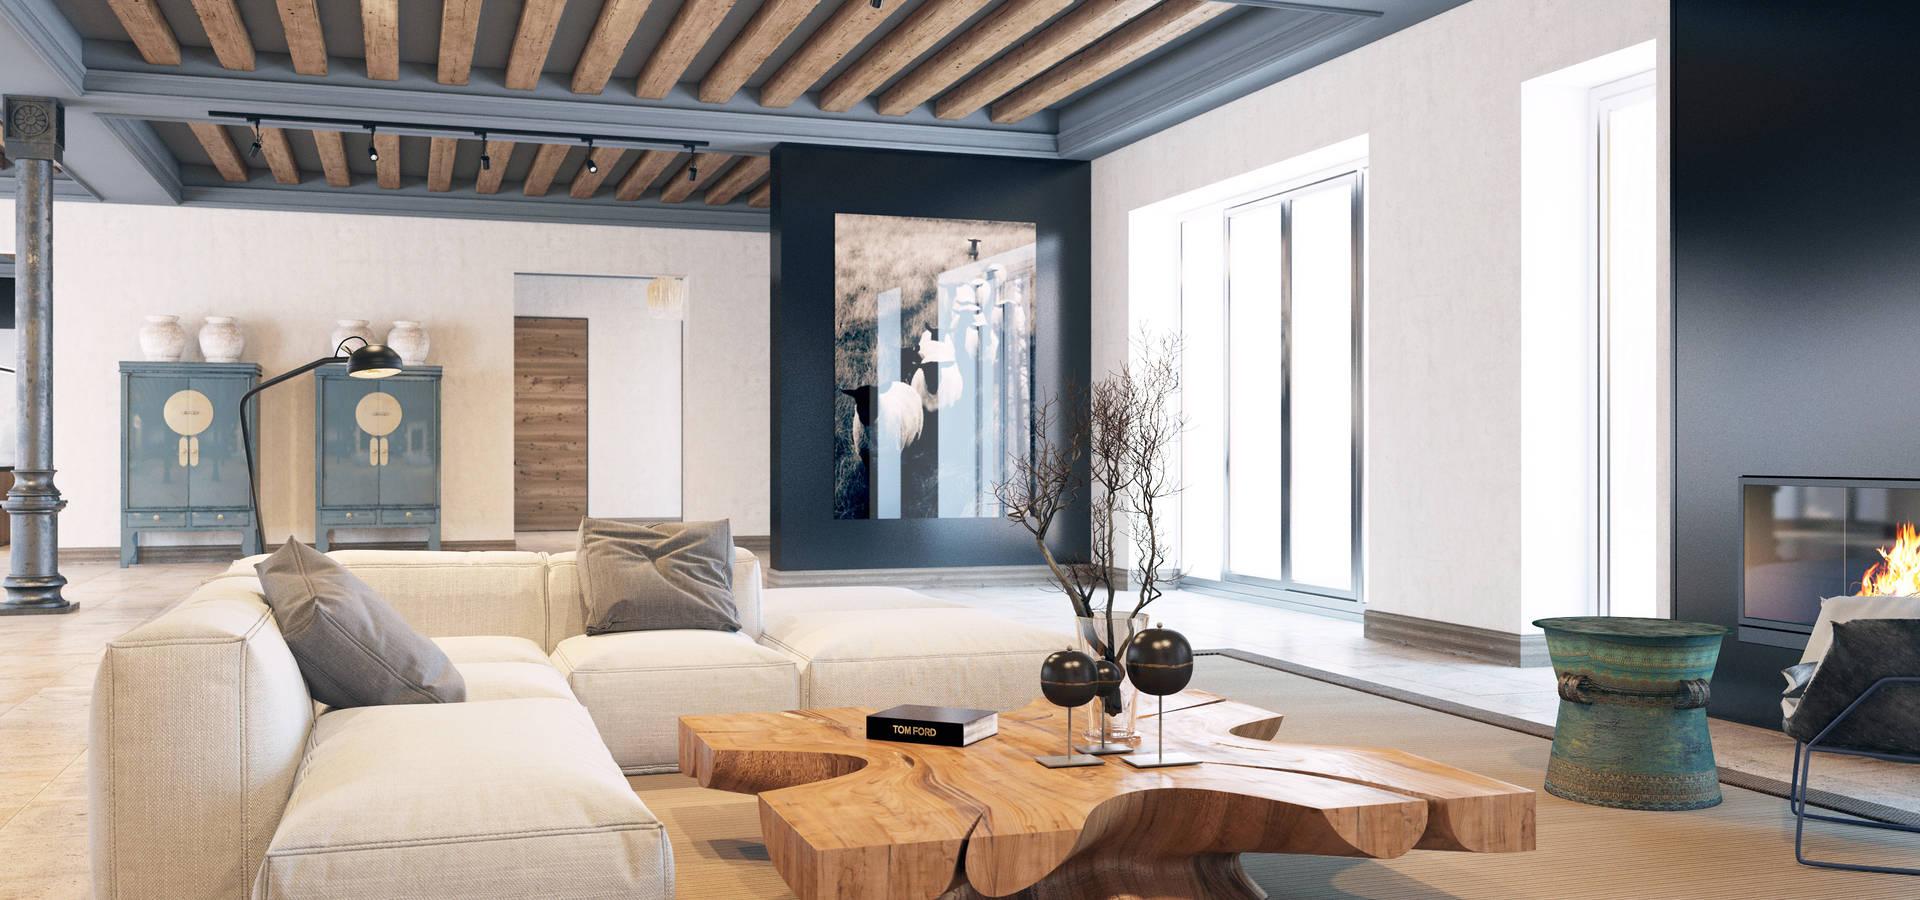 Pfayfer Fradina Design